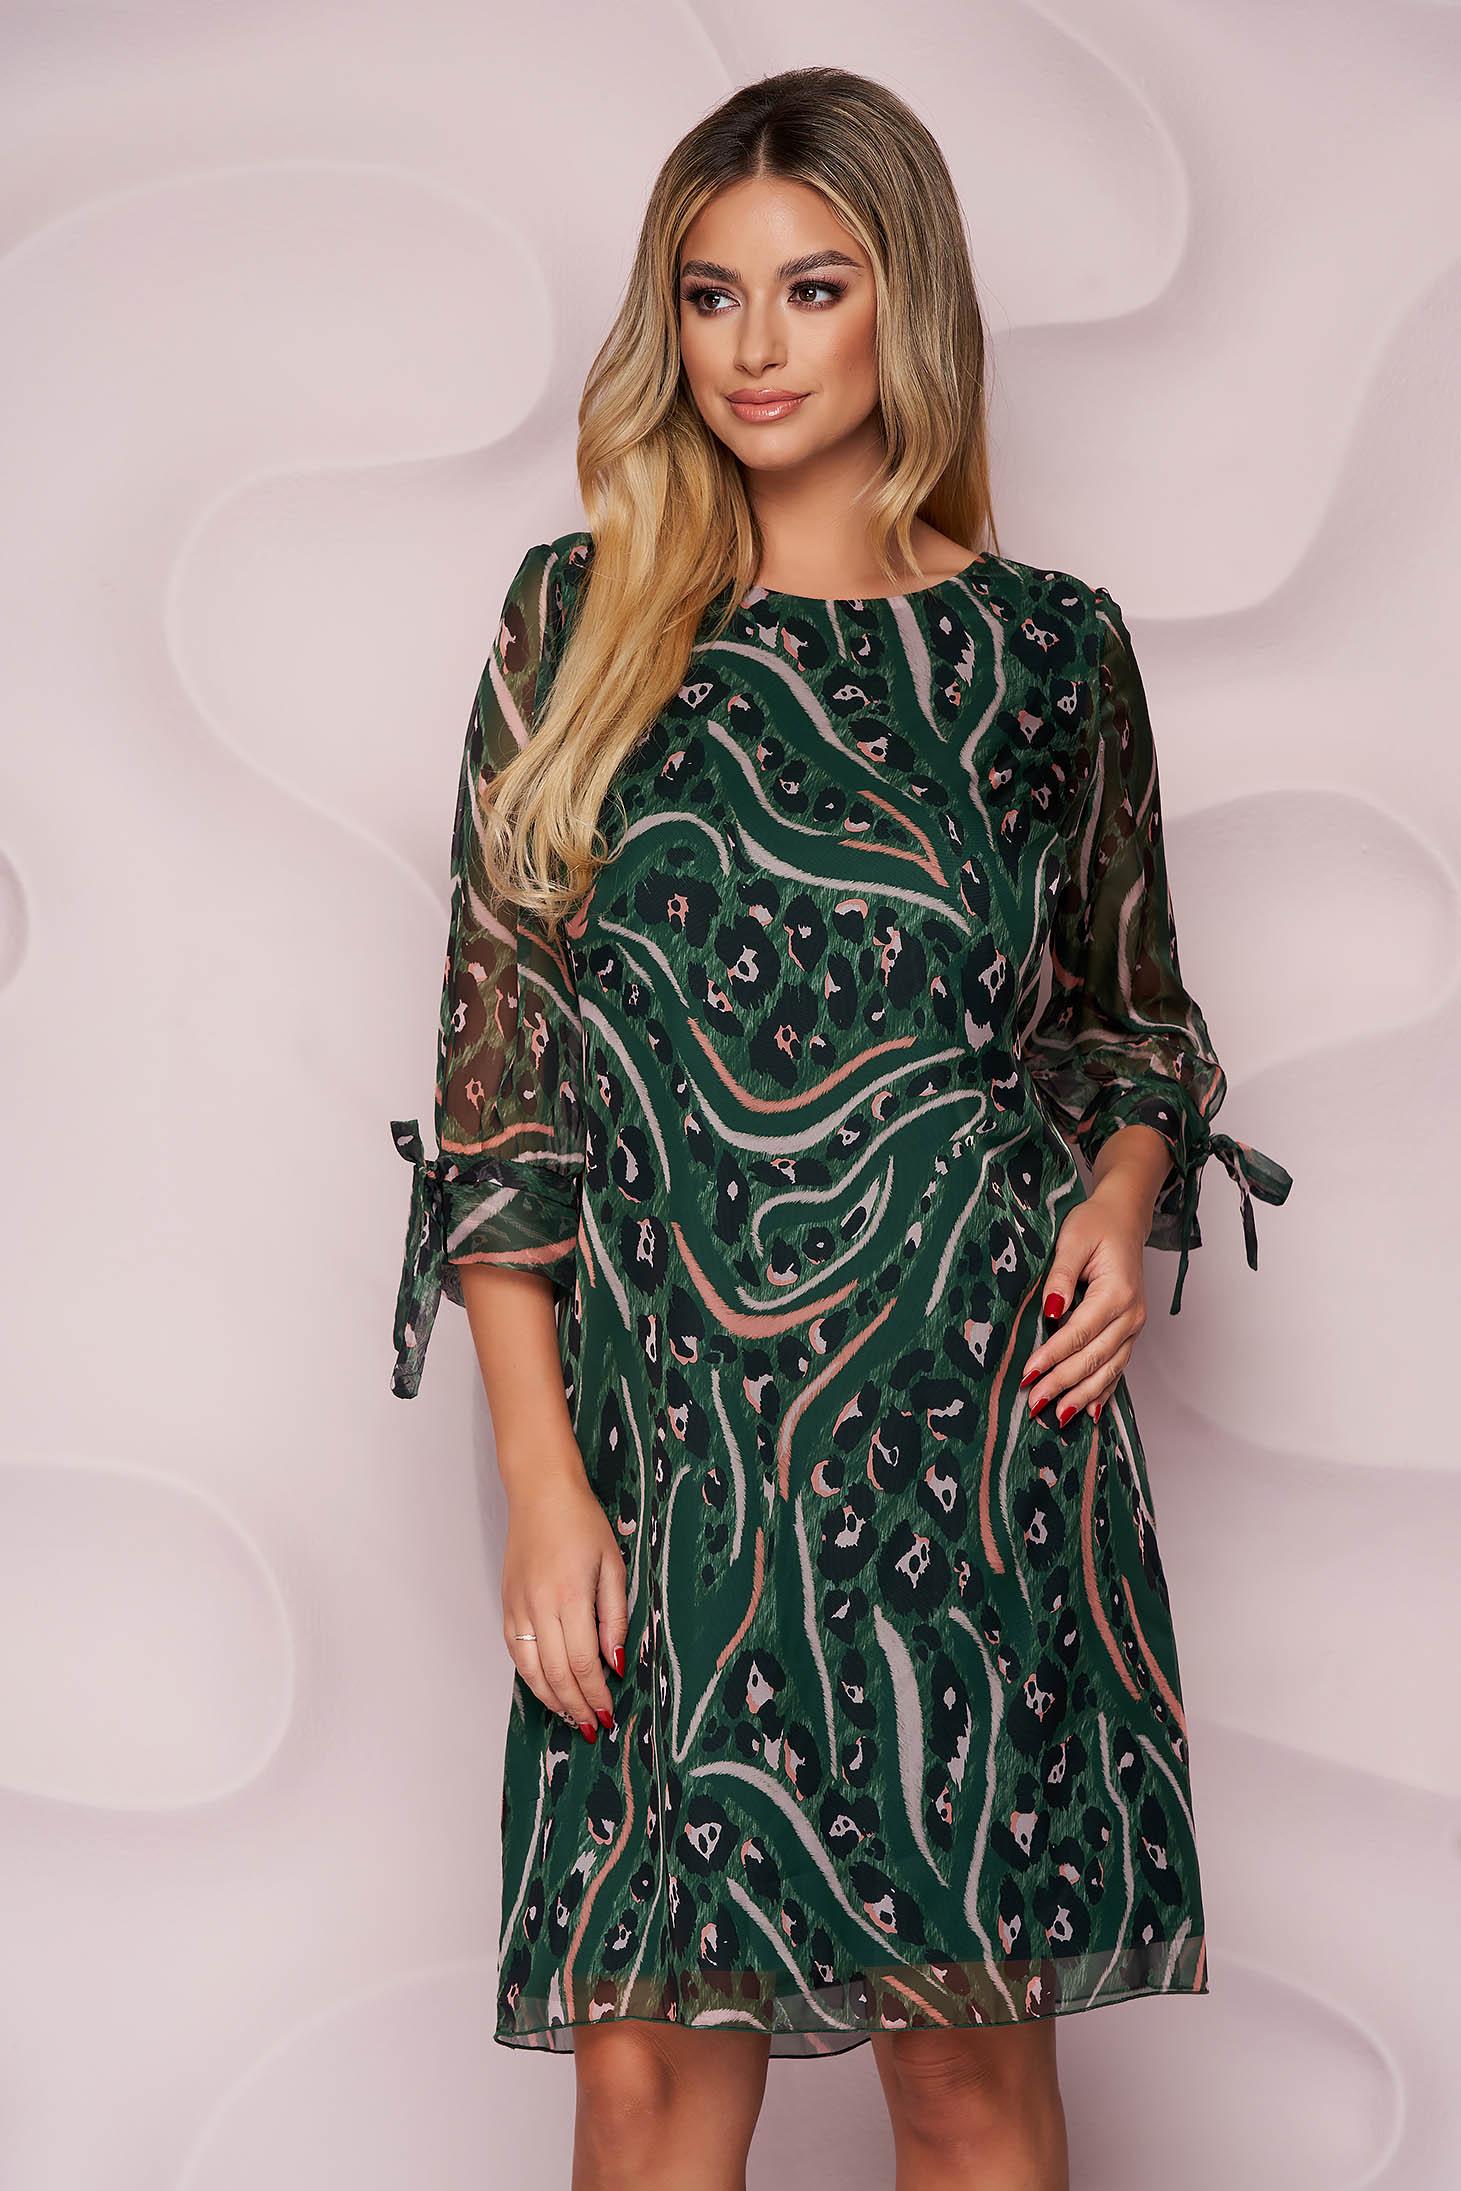 Dress straight short cut thin fabric nonelastic fabric from veil